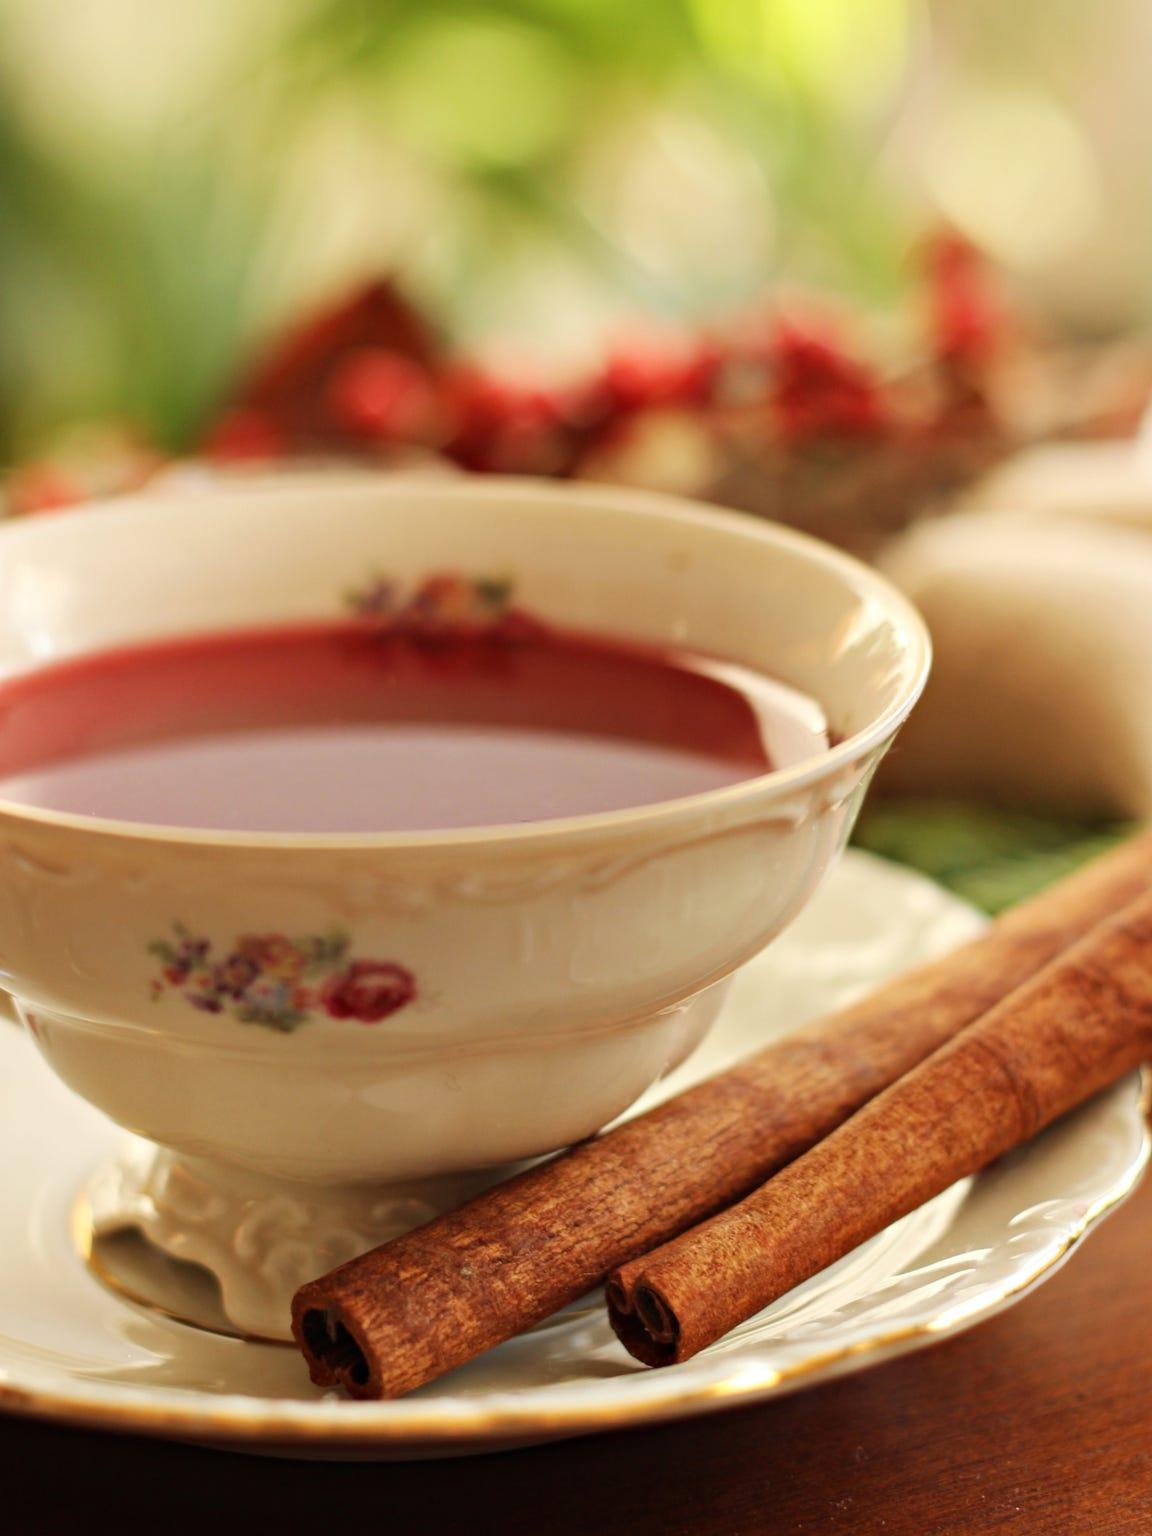 Enjoy tea in a historic Victorian setting at Sam Davis